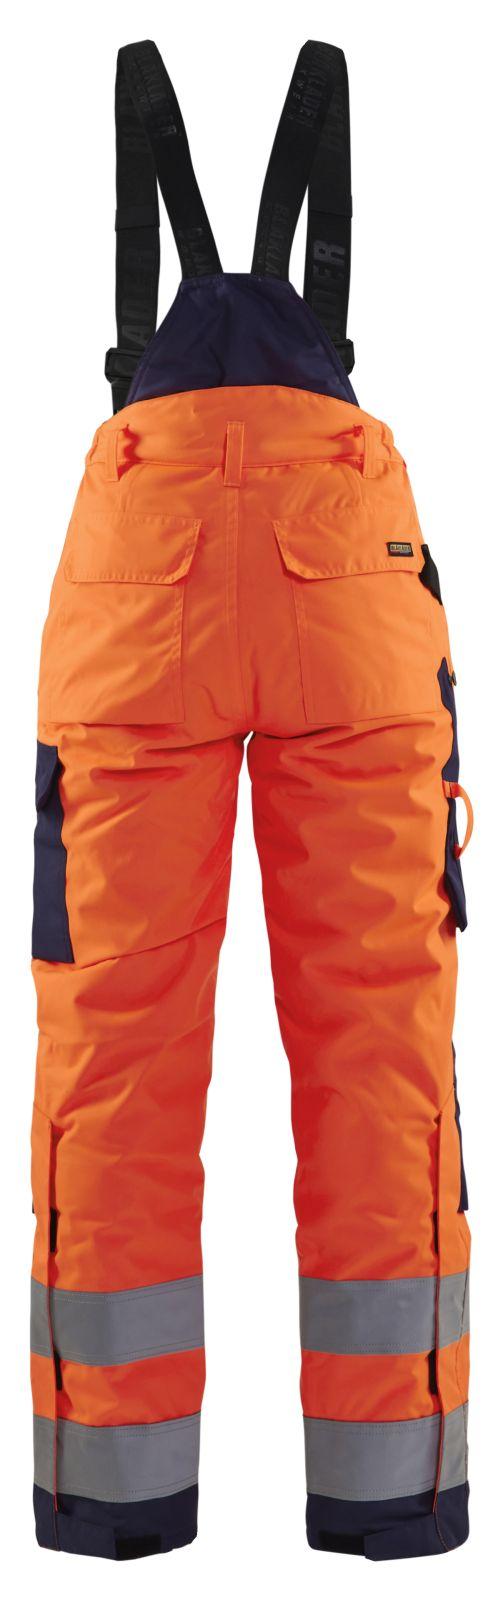 Blaklader Dames Winterbroeken 78851977 High Vis oranje-marineblauw(5389)